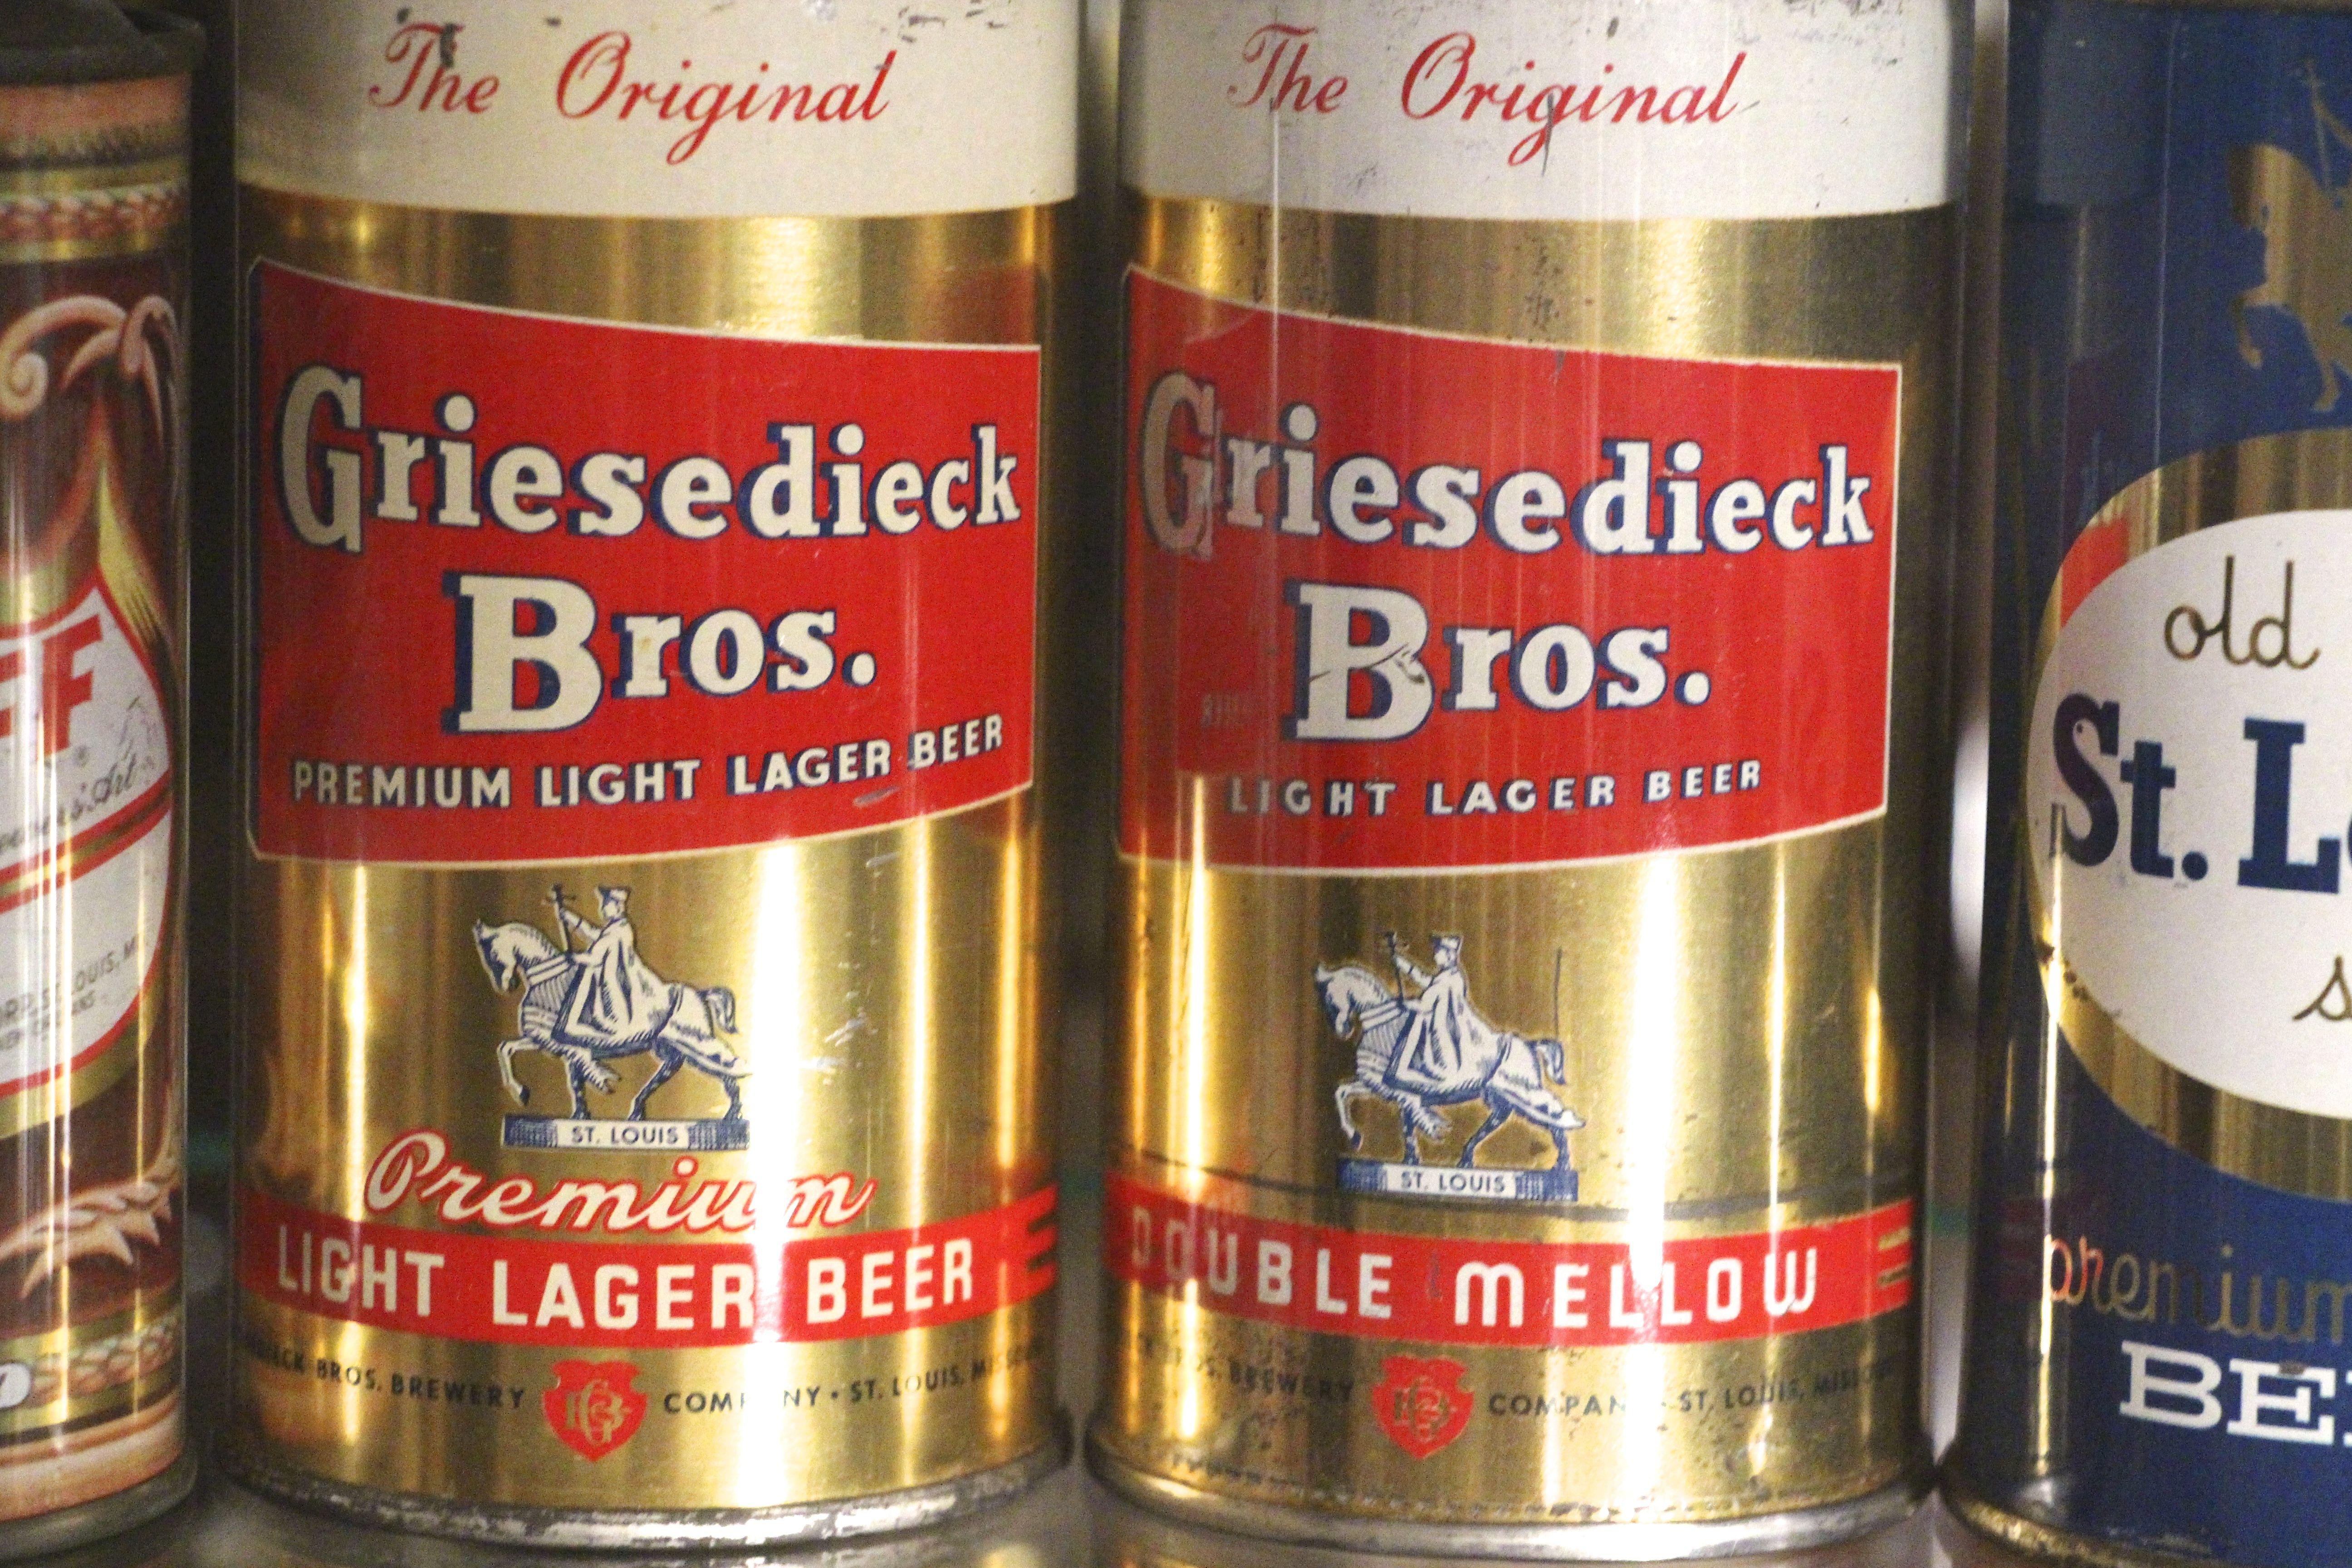 Griesedieck Bros Flat Top Beer Cans St Louis Mo Beer Beer Can Collection Beer Pub